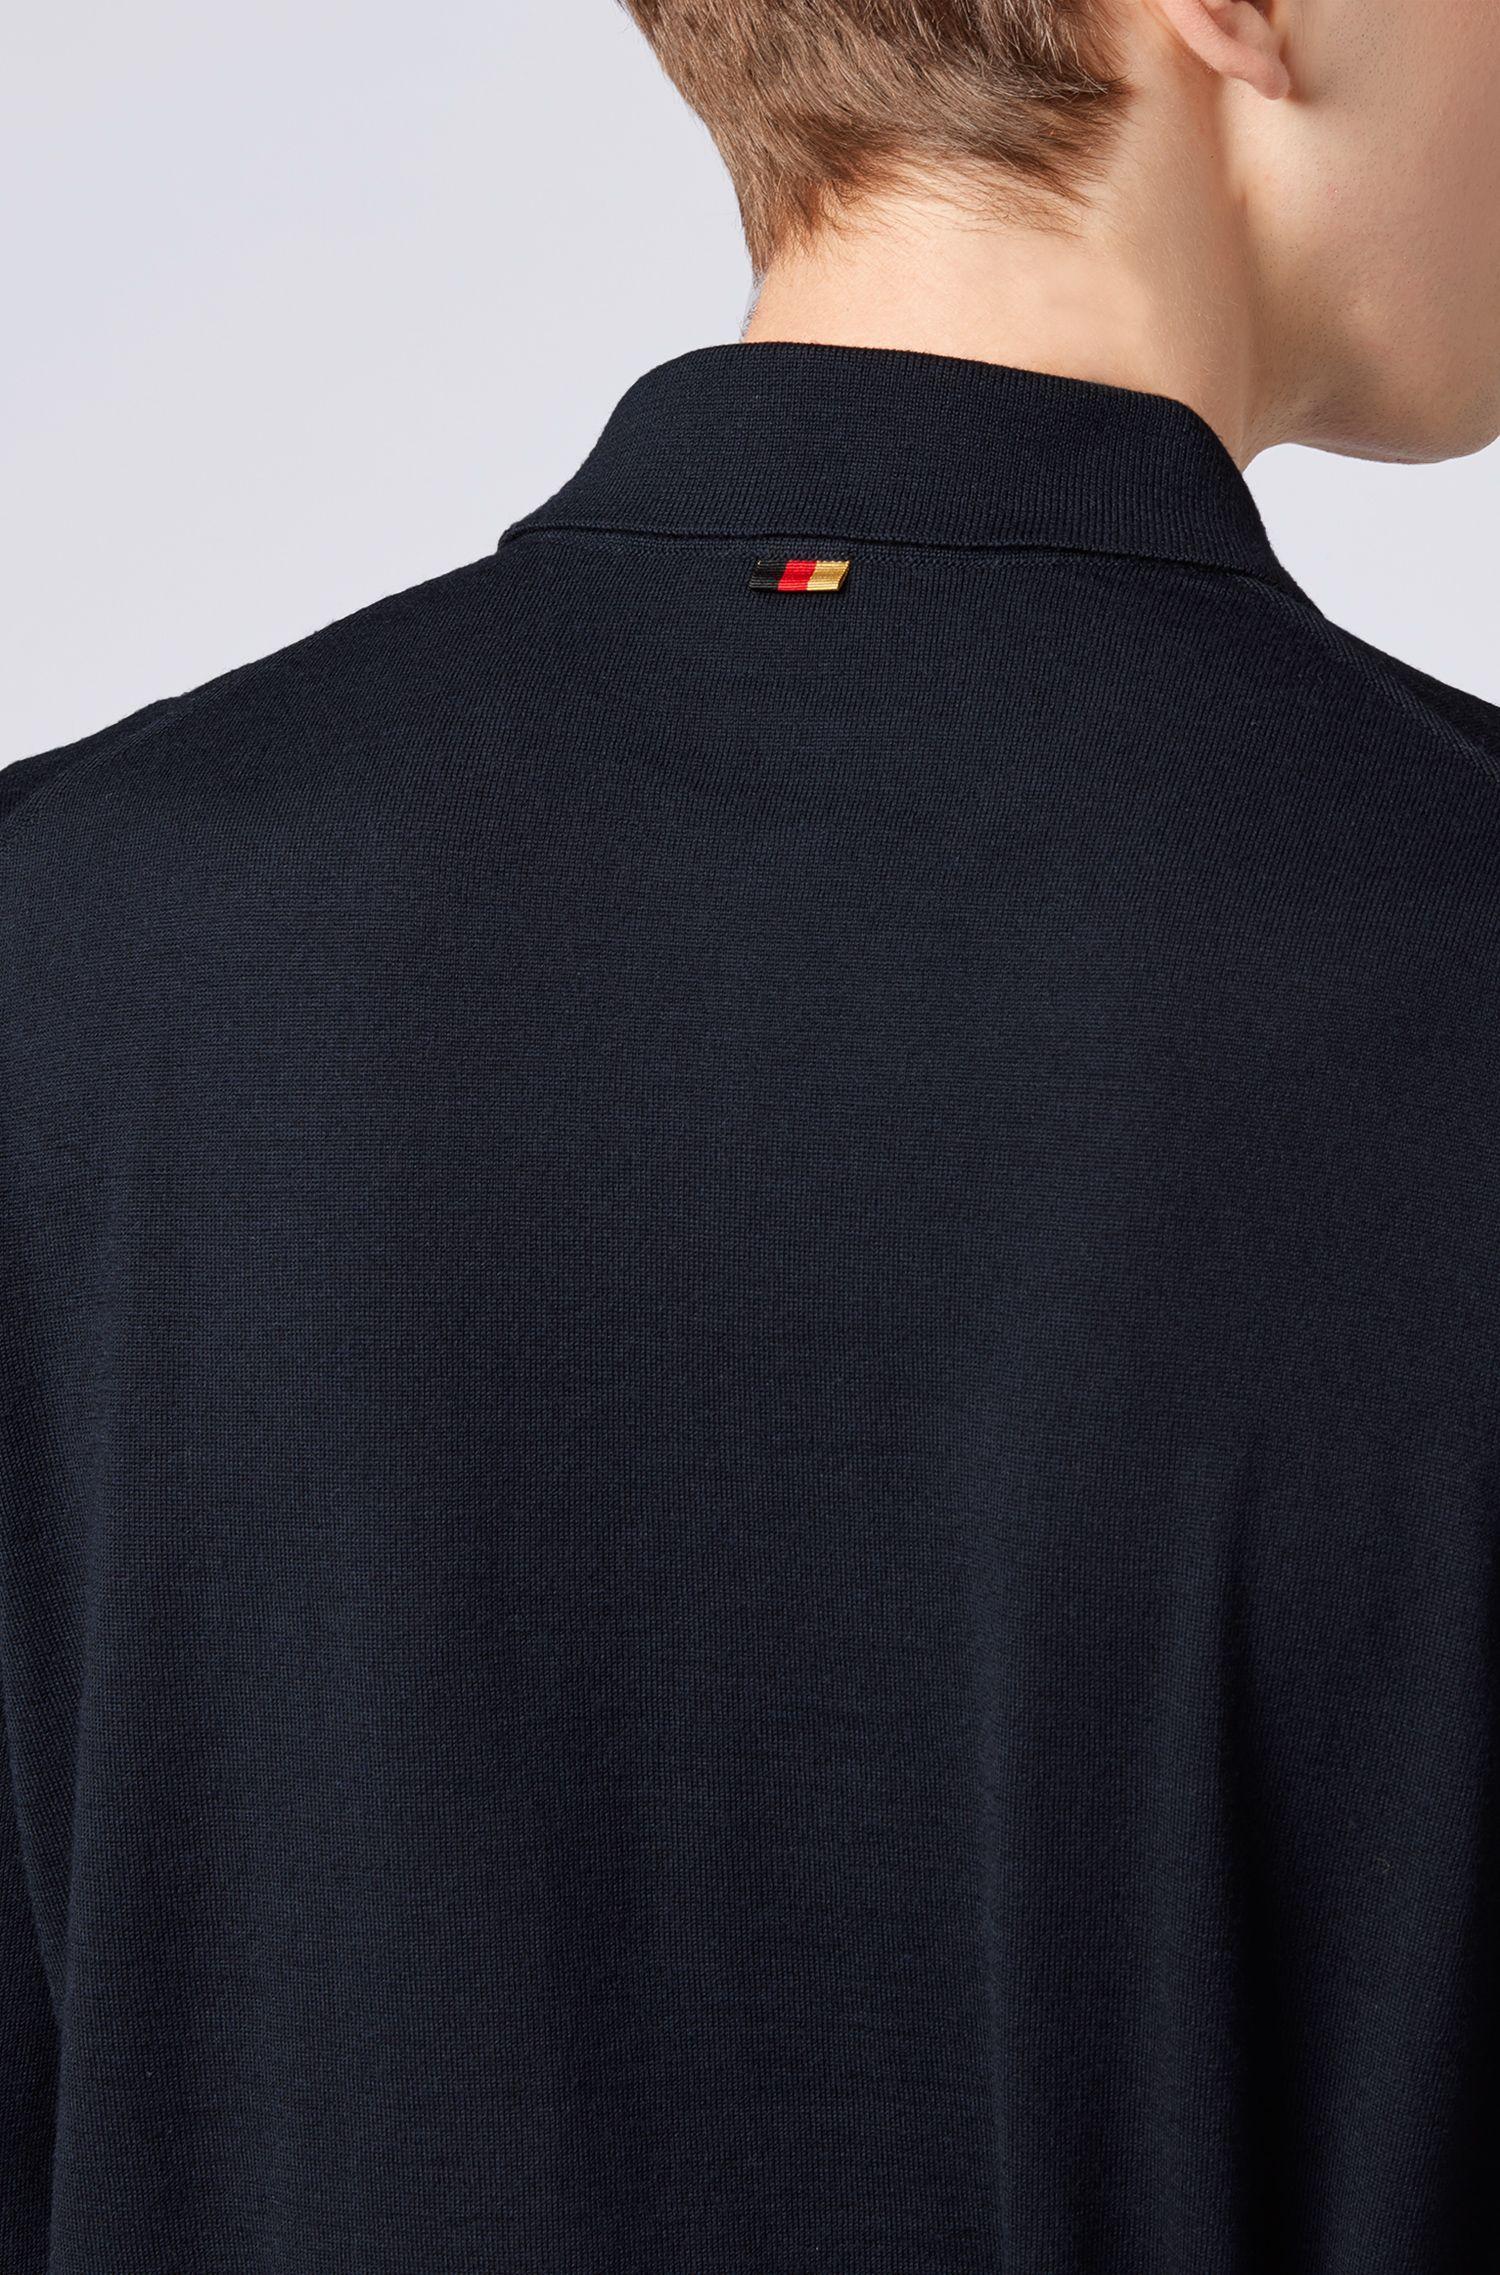 Sweater in virgin wool with polo collar